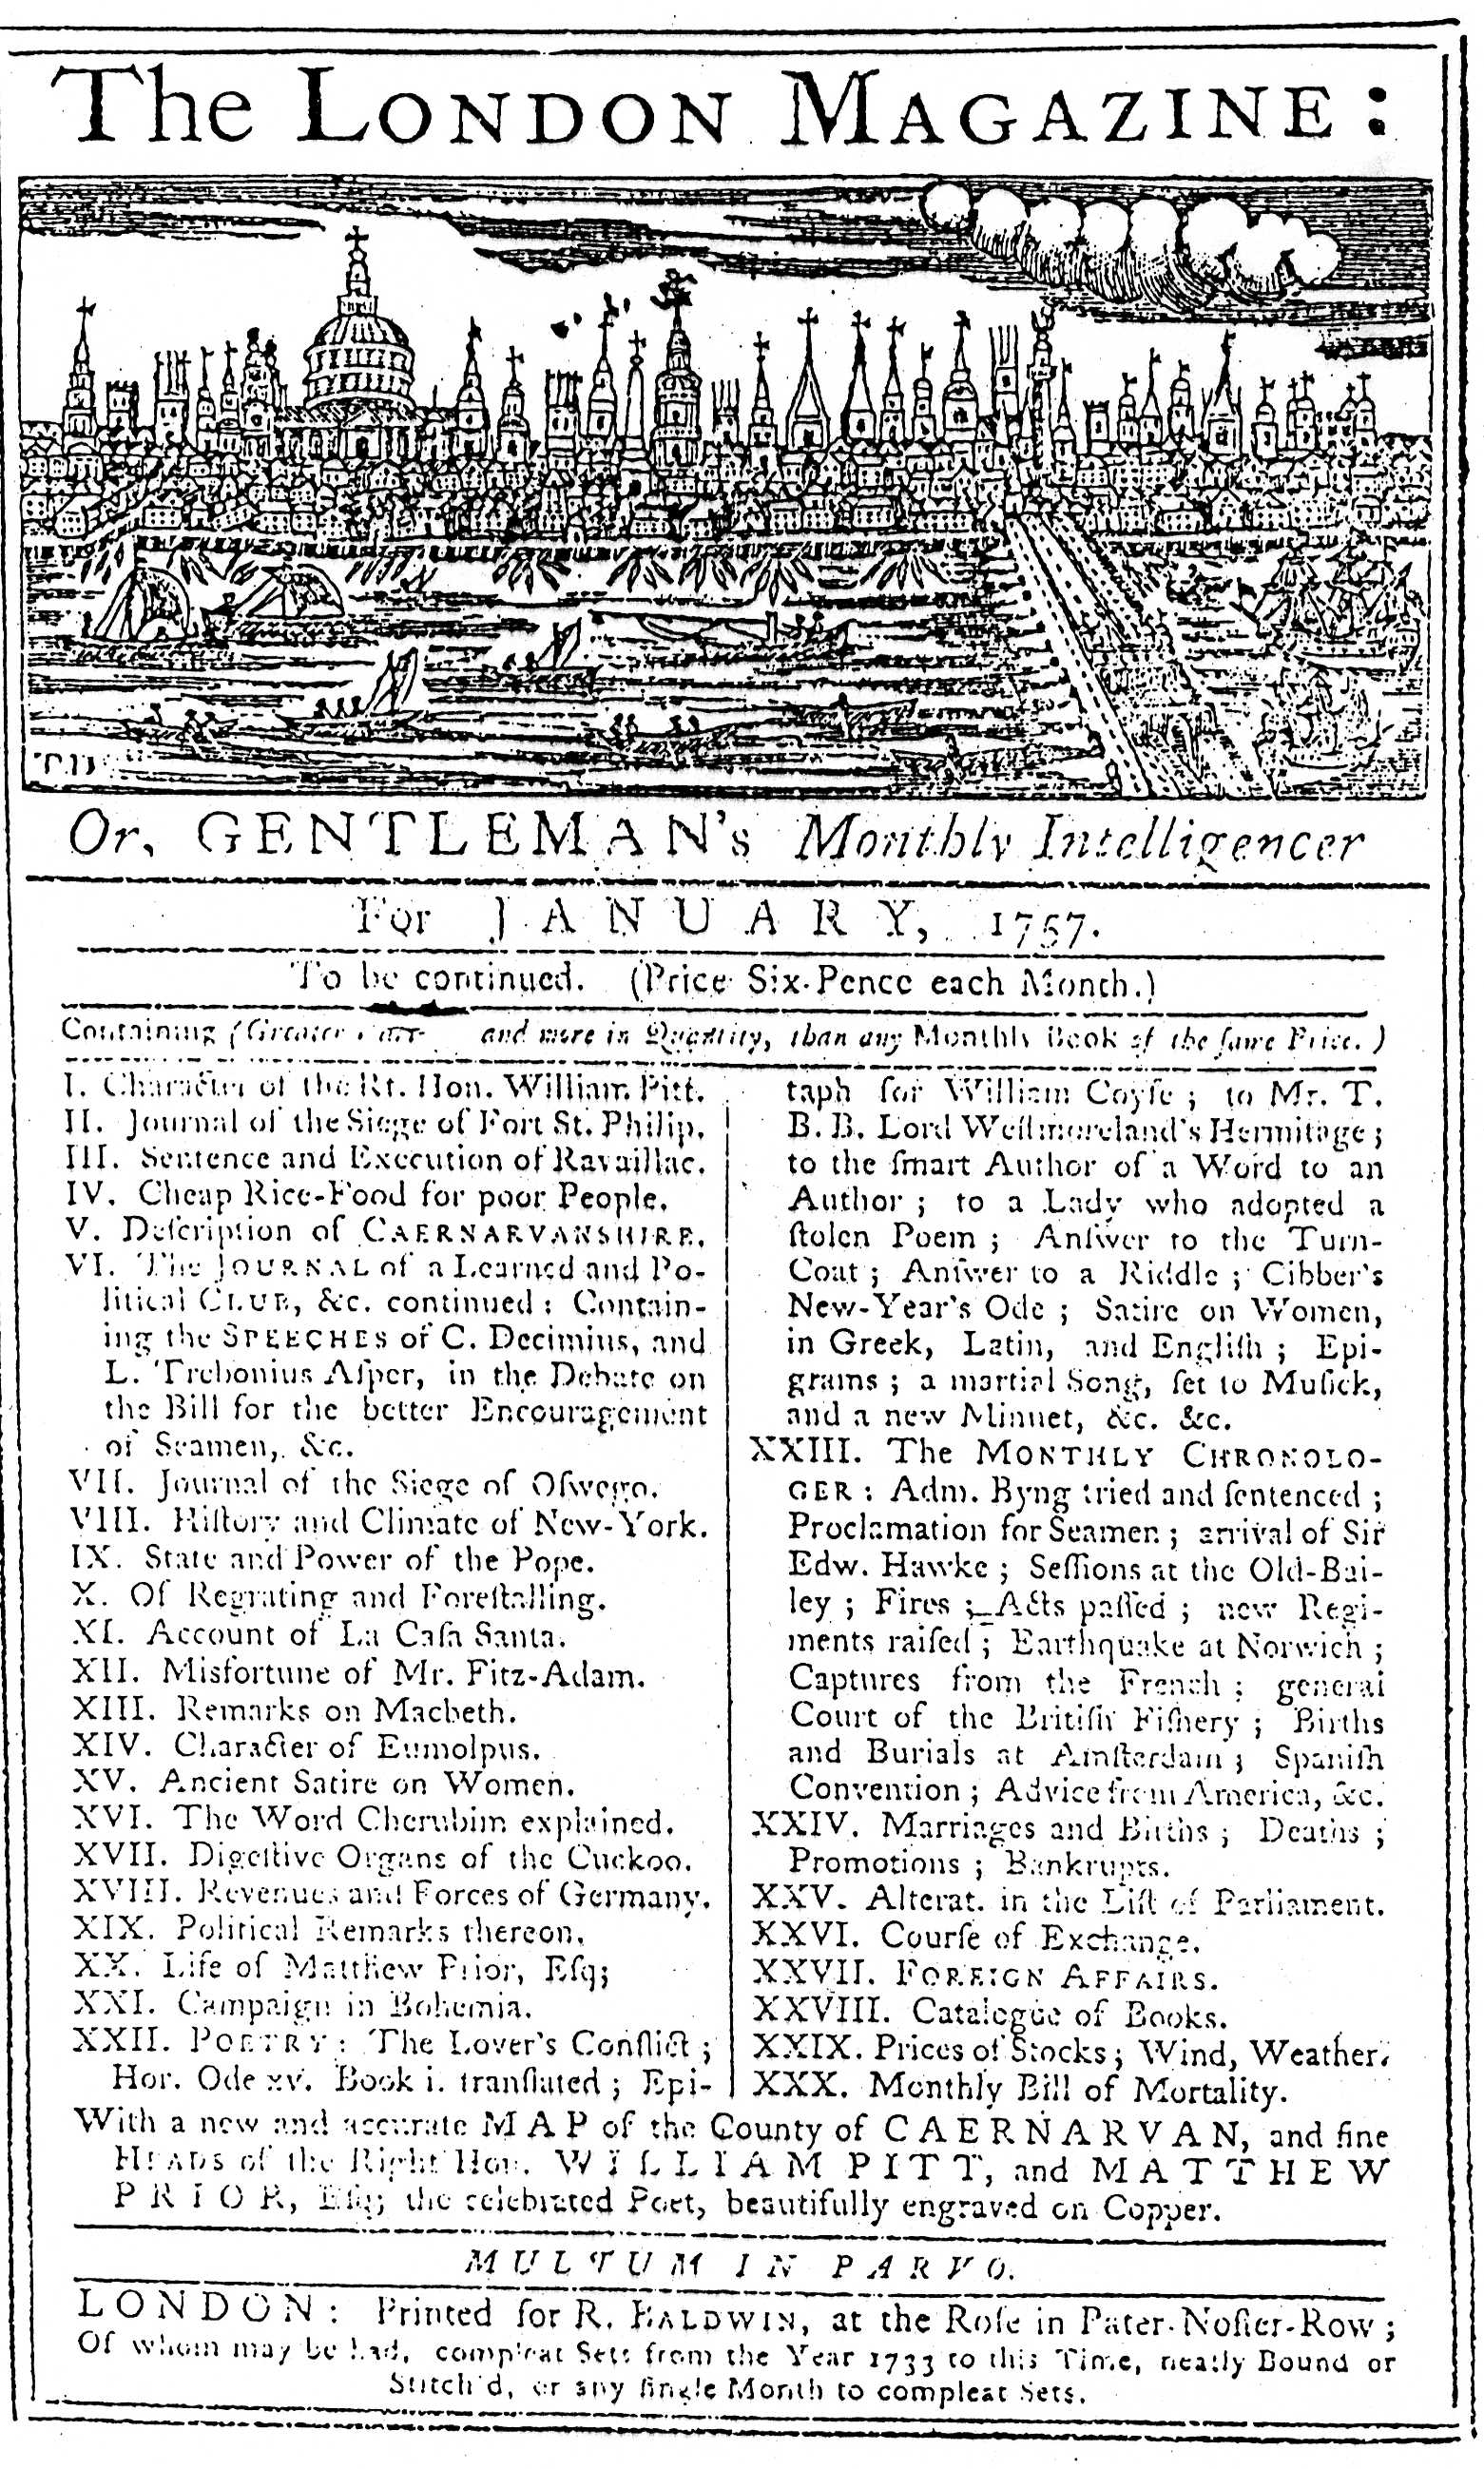 London Magazine for January, 1757